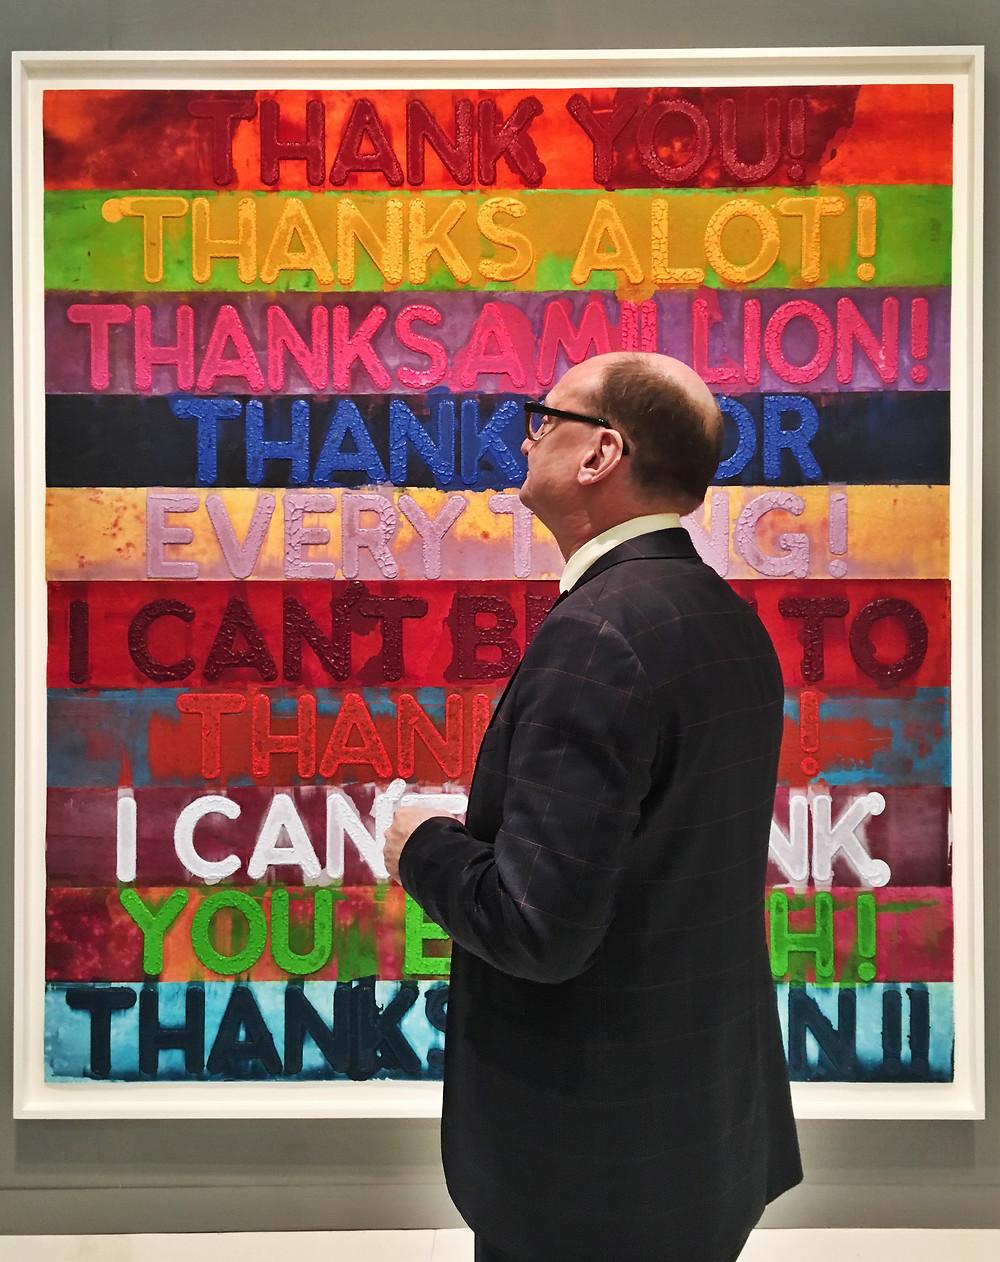 armory show 2017, pier 92, new york, nyc, howl magazine new york, chelsea art group, art, show, manhattan, donald christiansen, art advisory firm, invest in history, buying art, mel bochner, warhol, modern art,